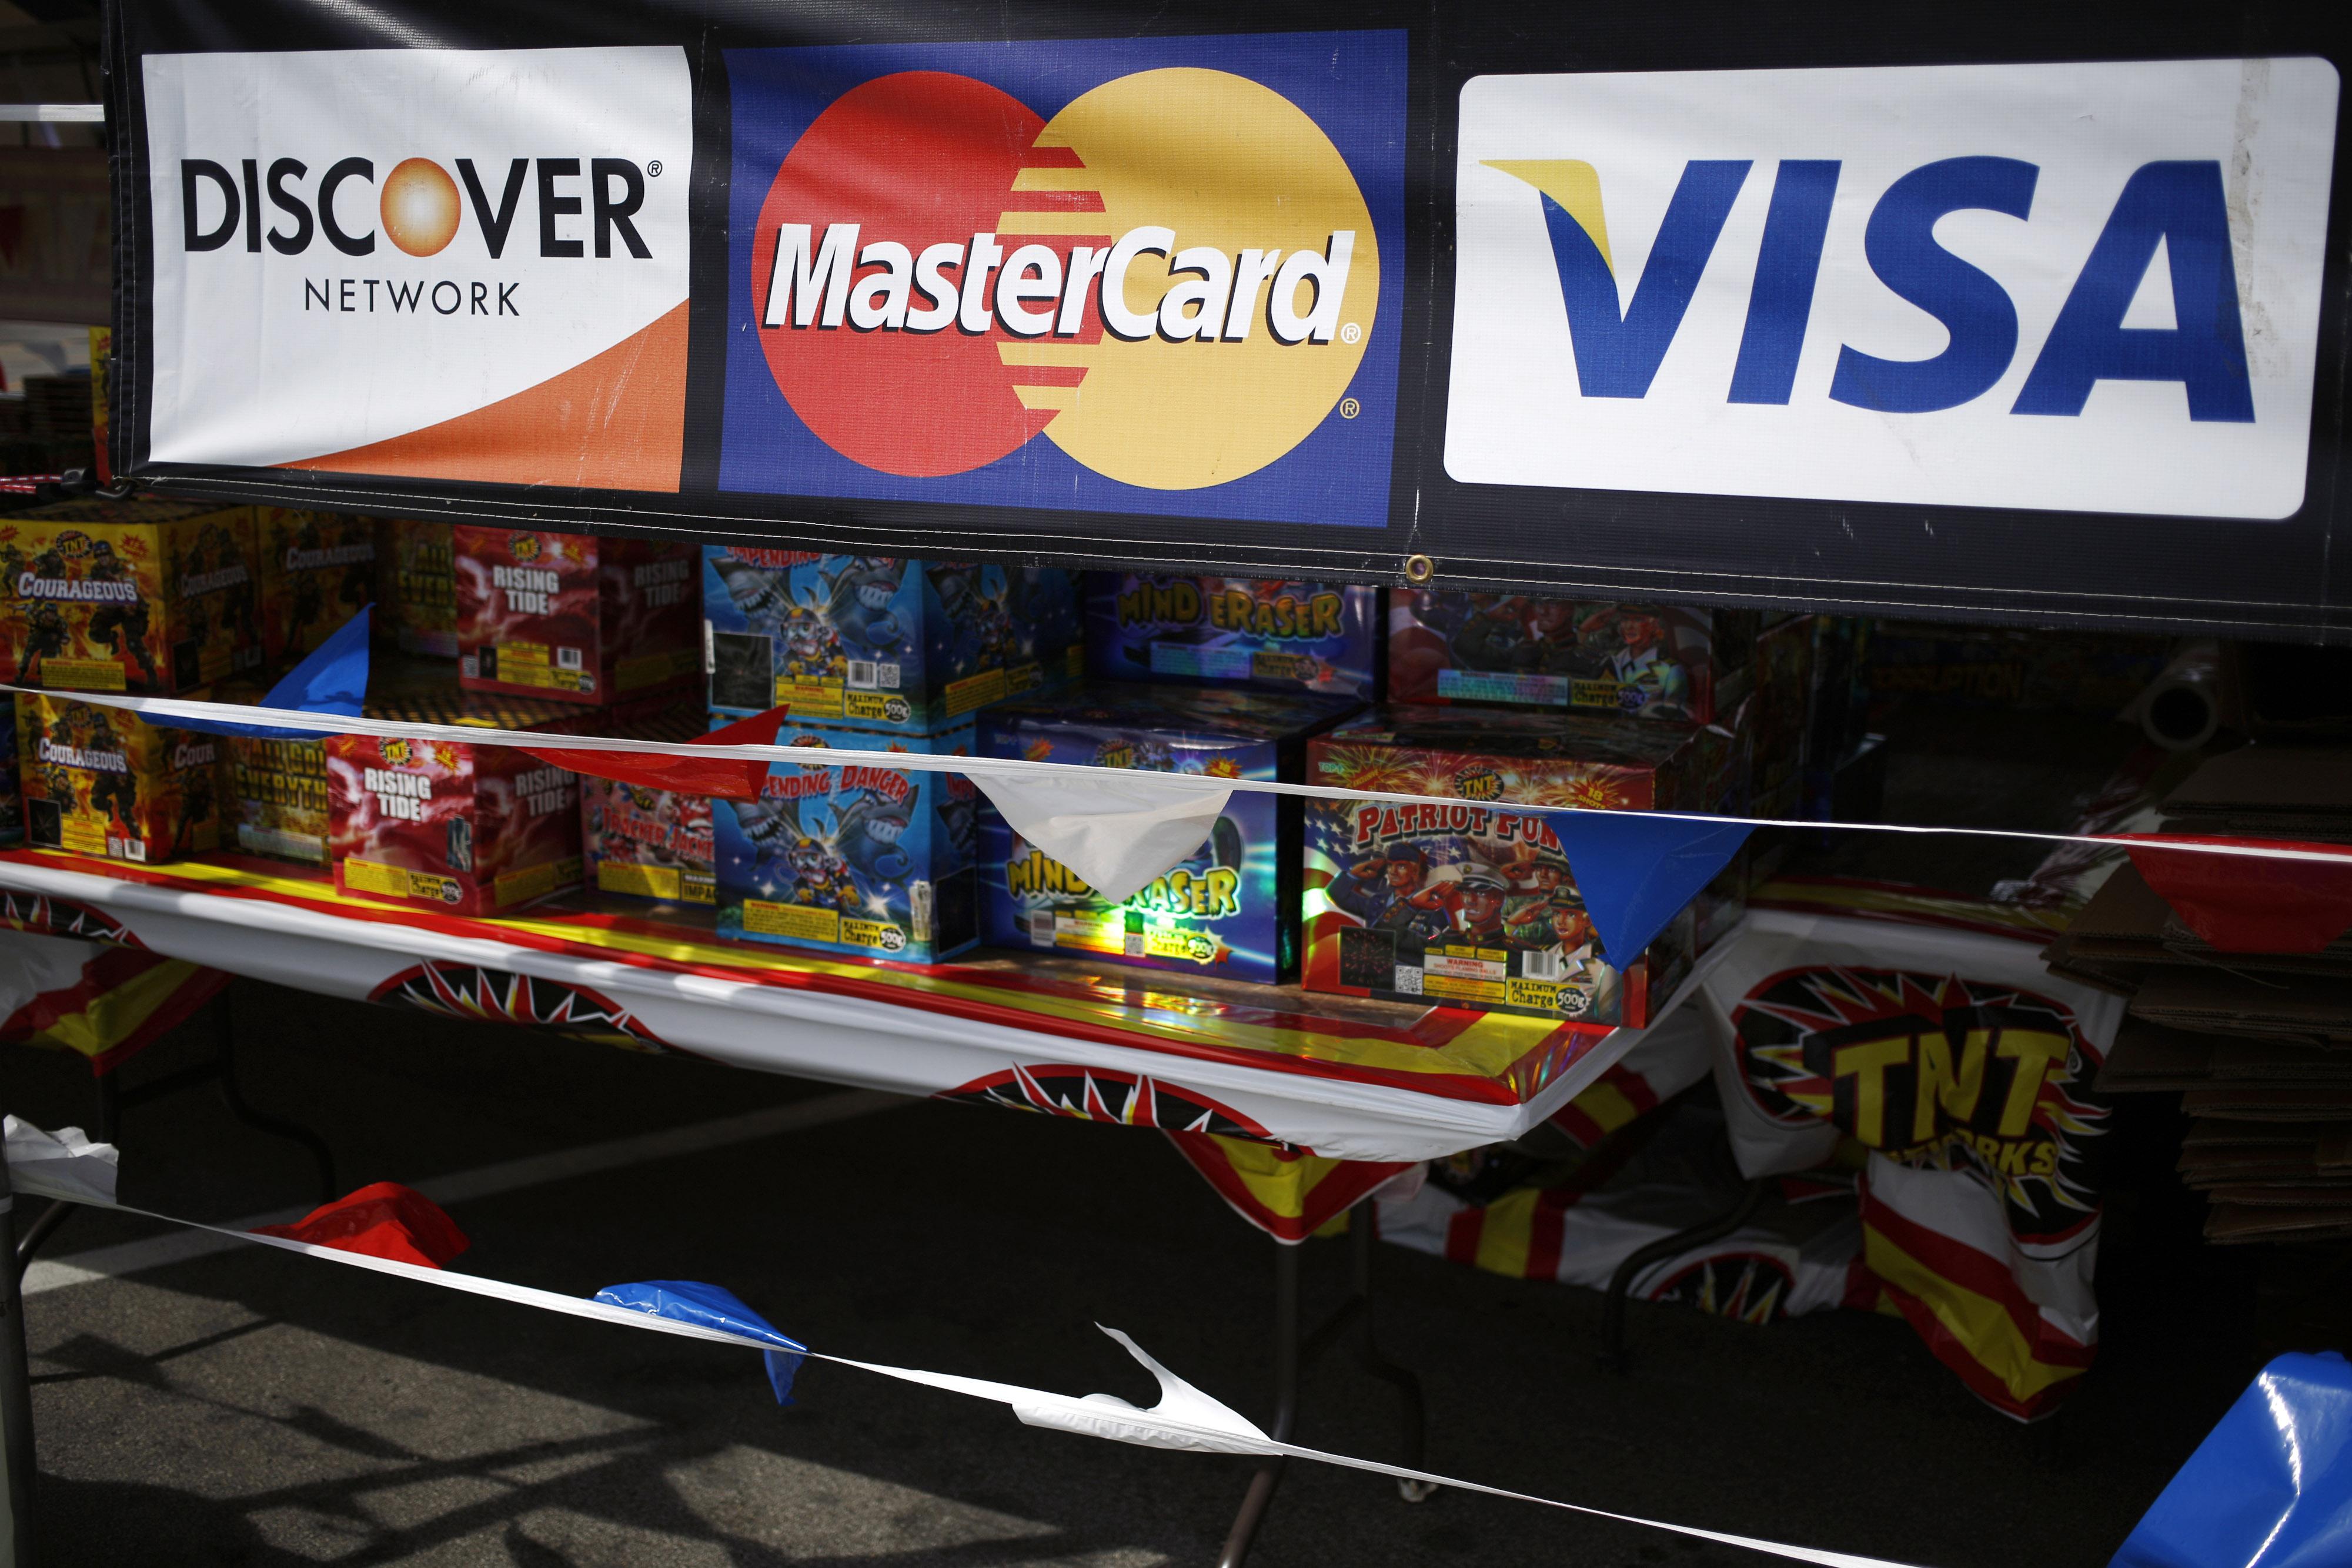 https://assets.sourcemedia.com/eb/aa/826f05414d4b927f6123cfc28ae4/discover-mastercard-visa-bl-062817.jpg